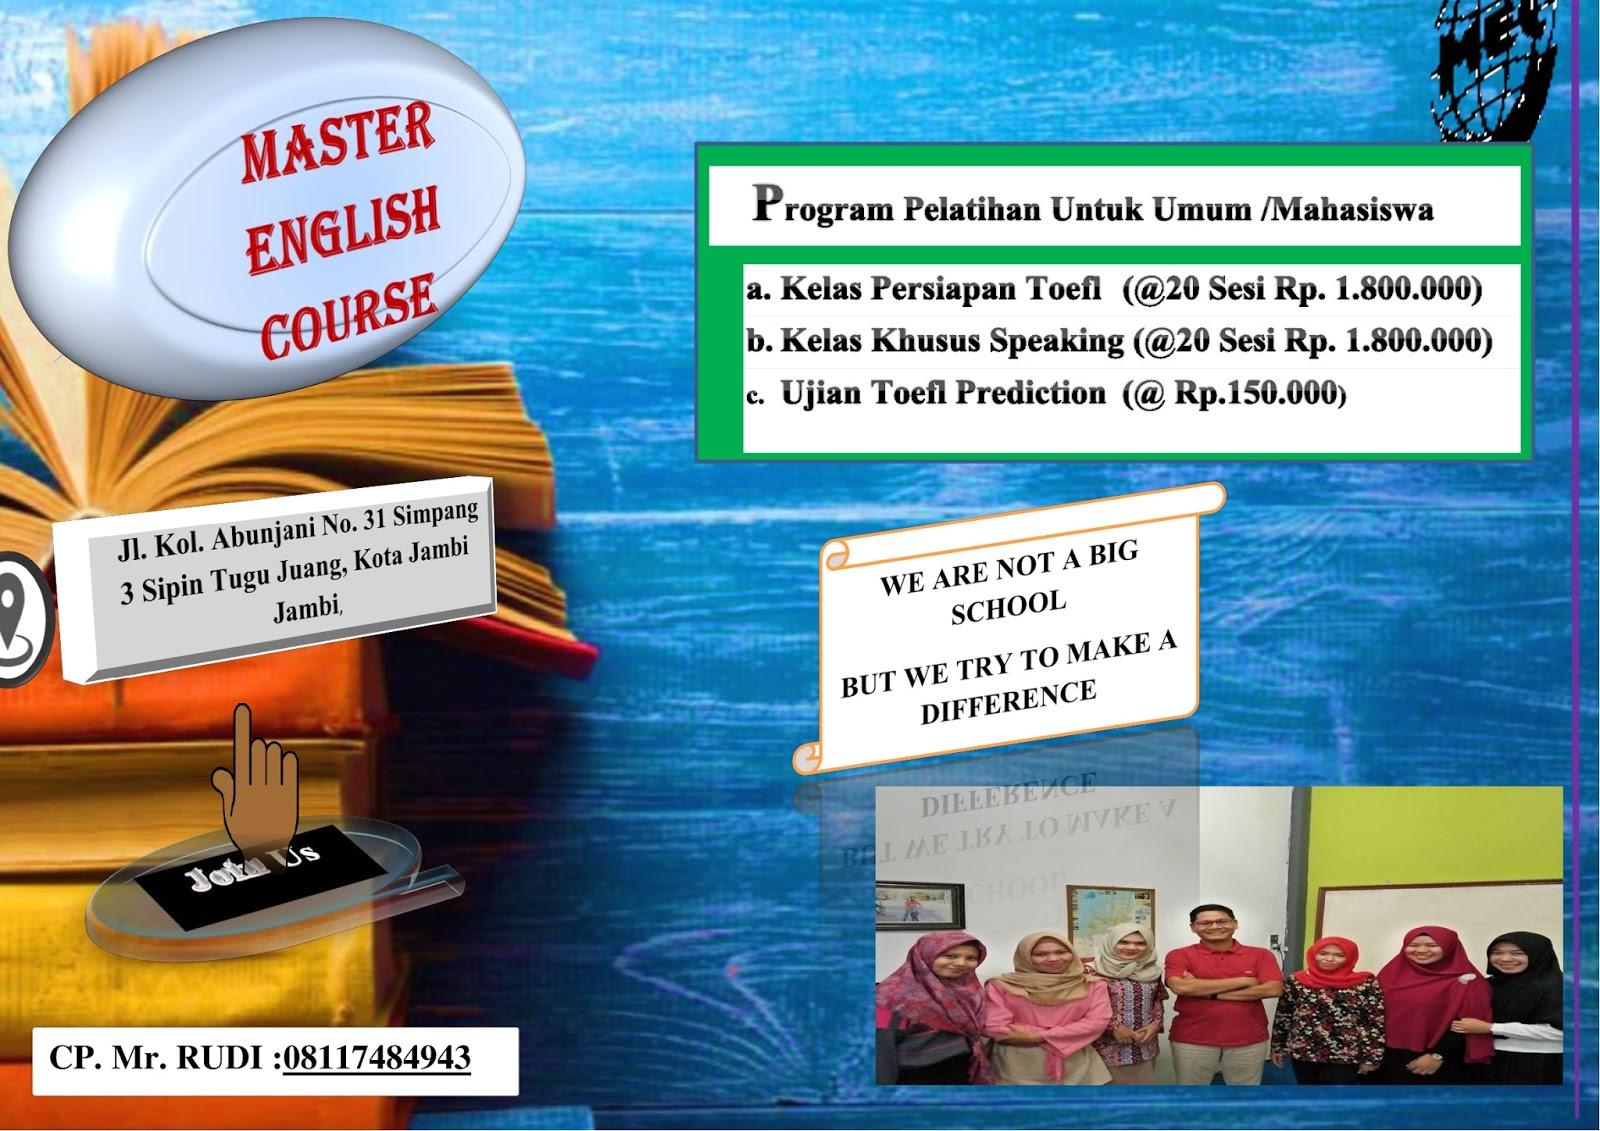 Rudi Hartono Ilmu Sejarah Fib Unja Mec Master English Kursus